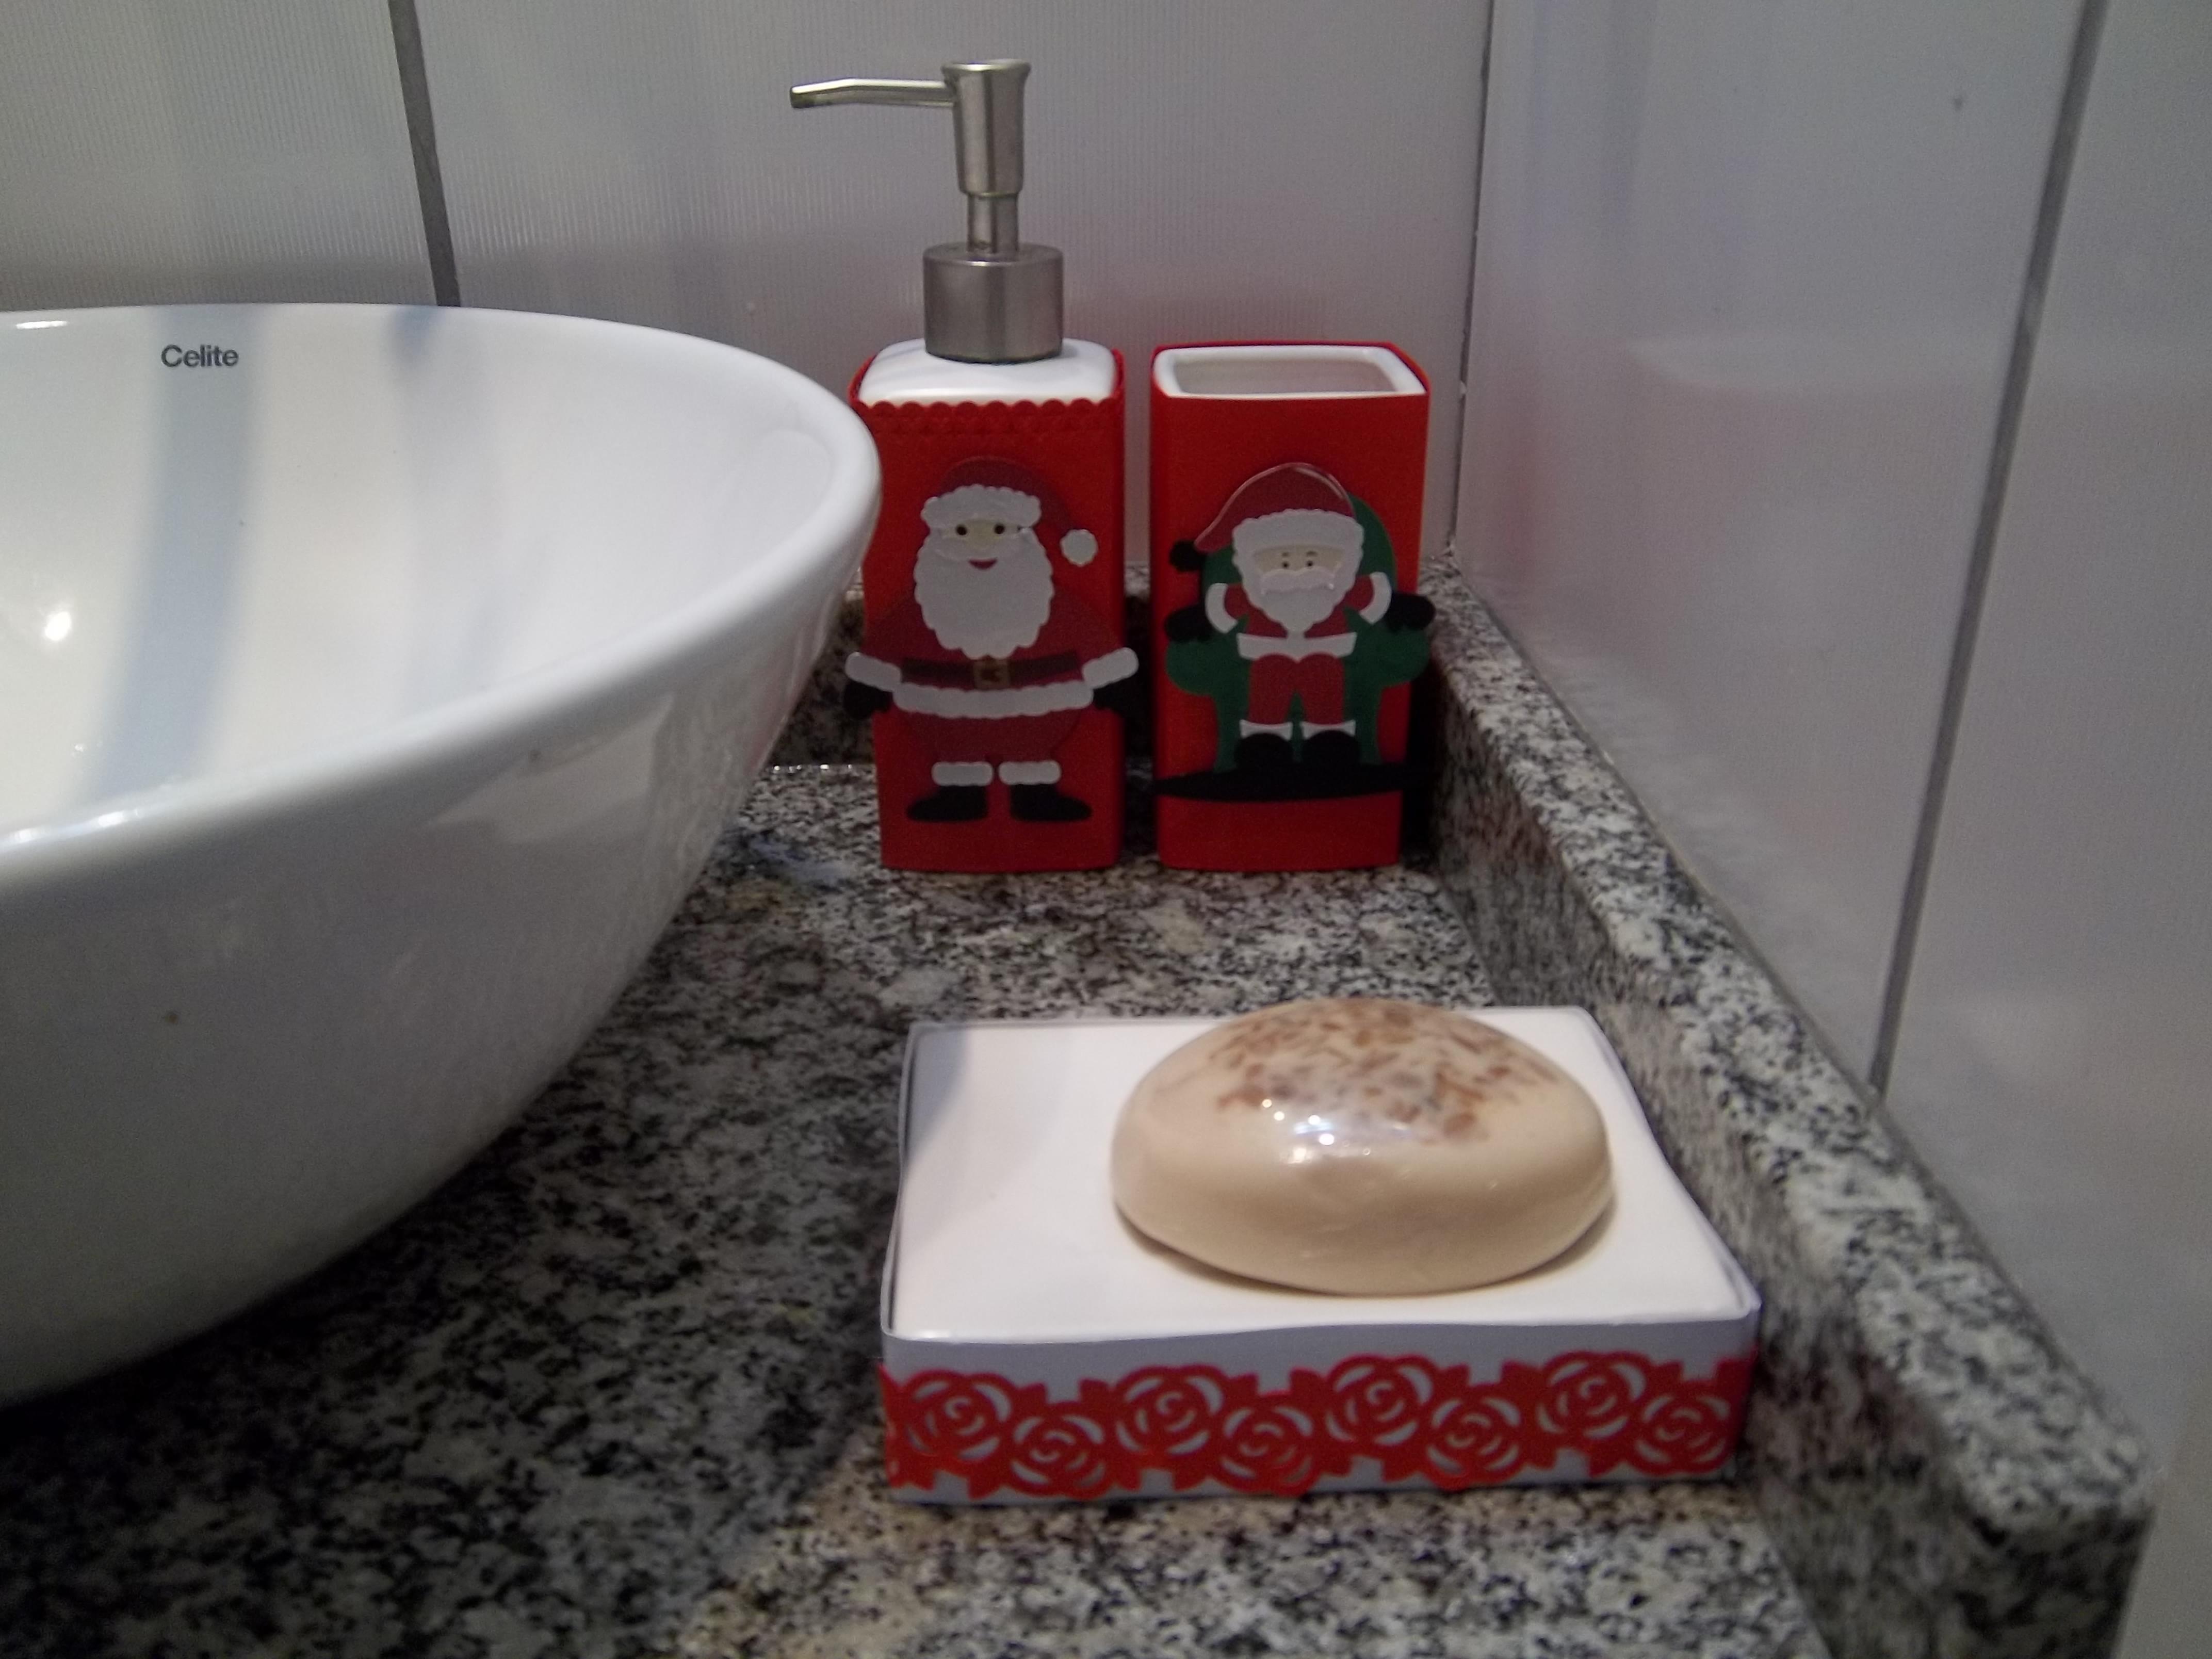 decoracao de lavabo para o natal : decoracao de lavabo para o natal: decoracao de natal lavabo decoracao natal decoracao de natal lavabo